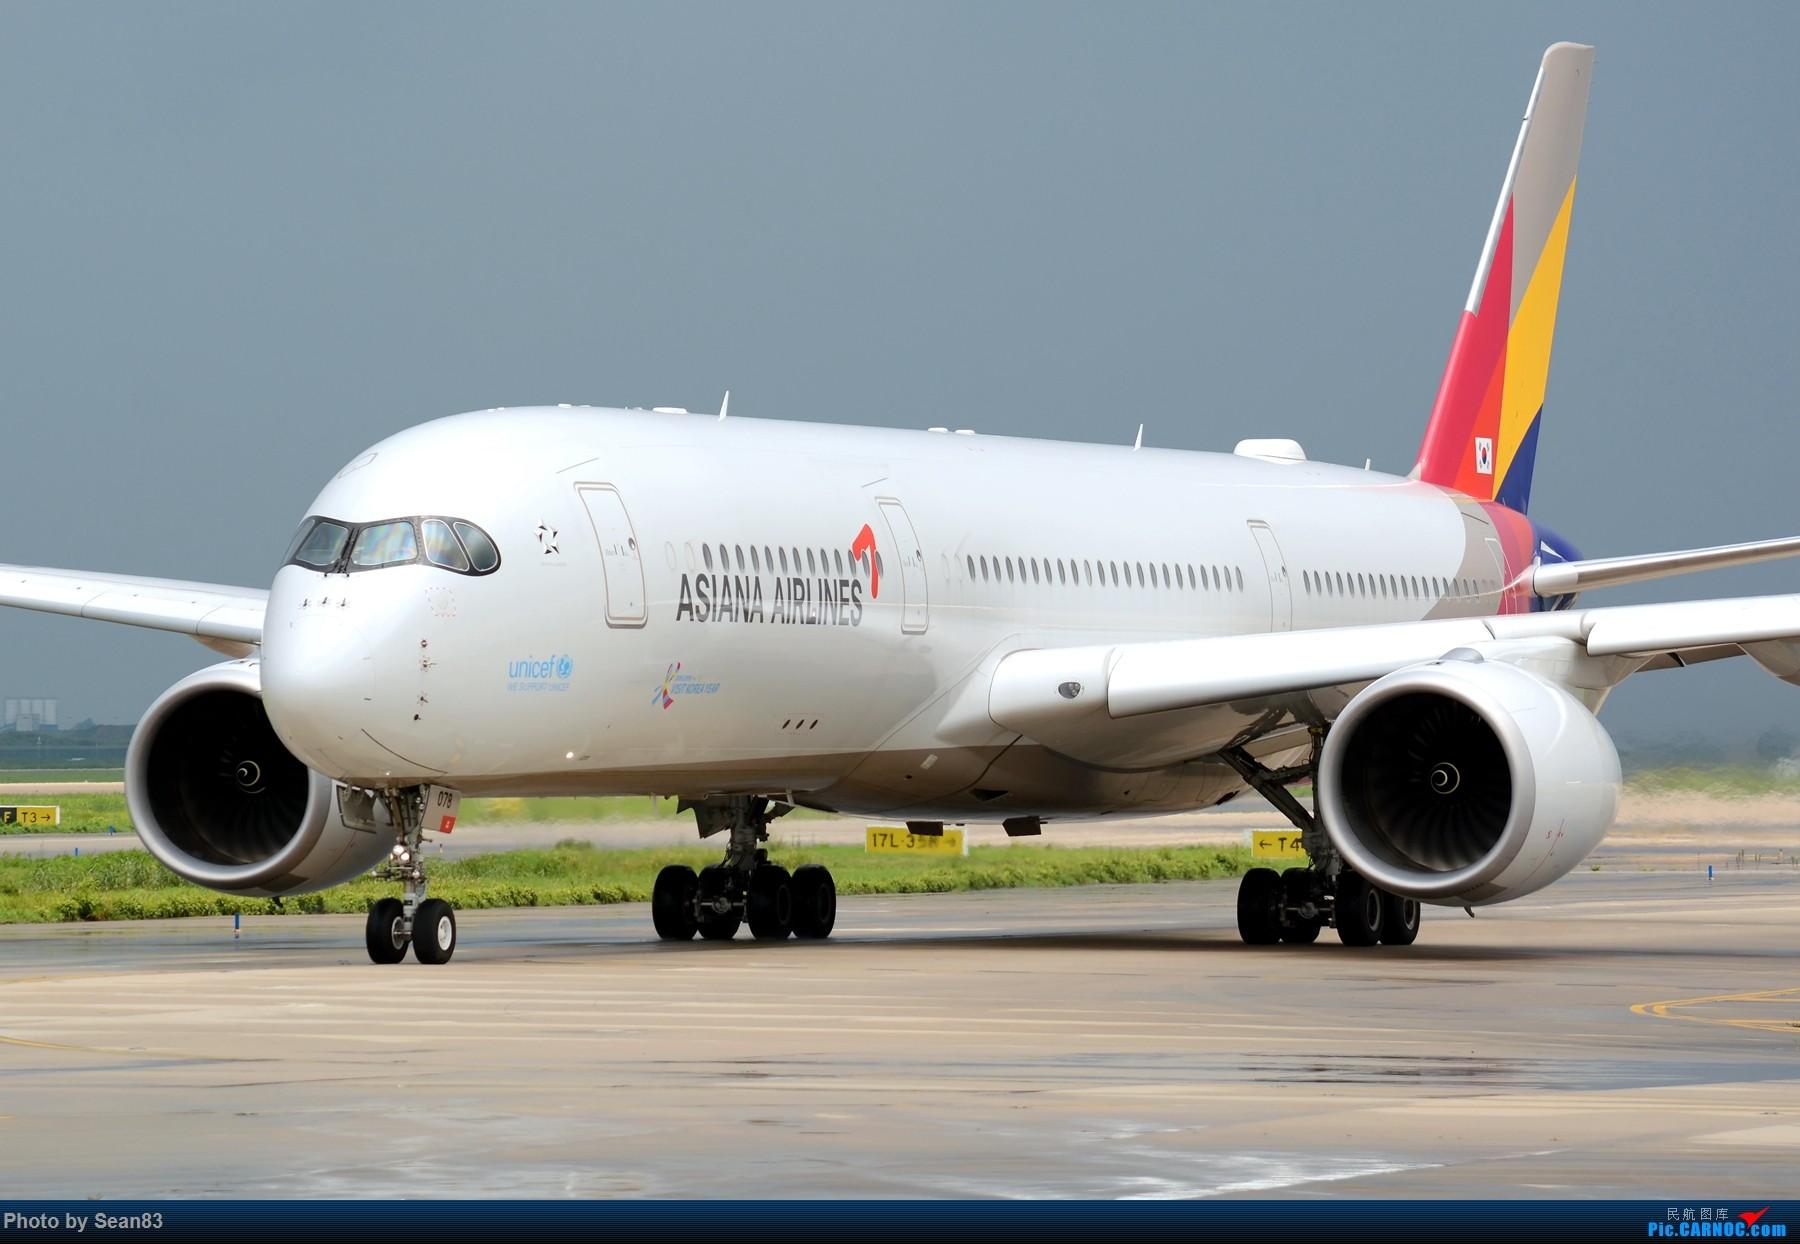 (PVG 1800*)韩亚350 大头照 AIRBUS A350-900 HL8078 上海浦东国际机场